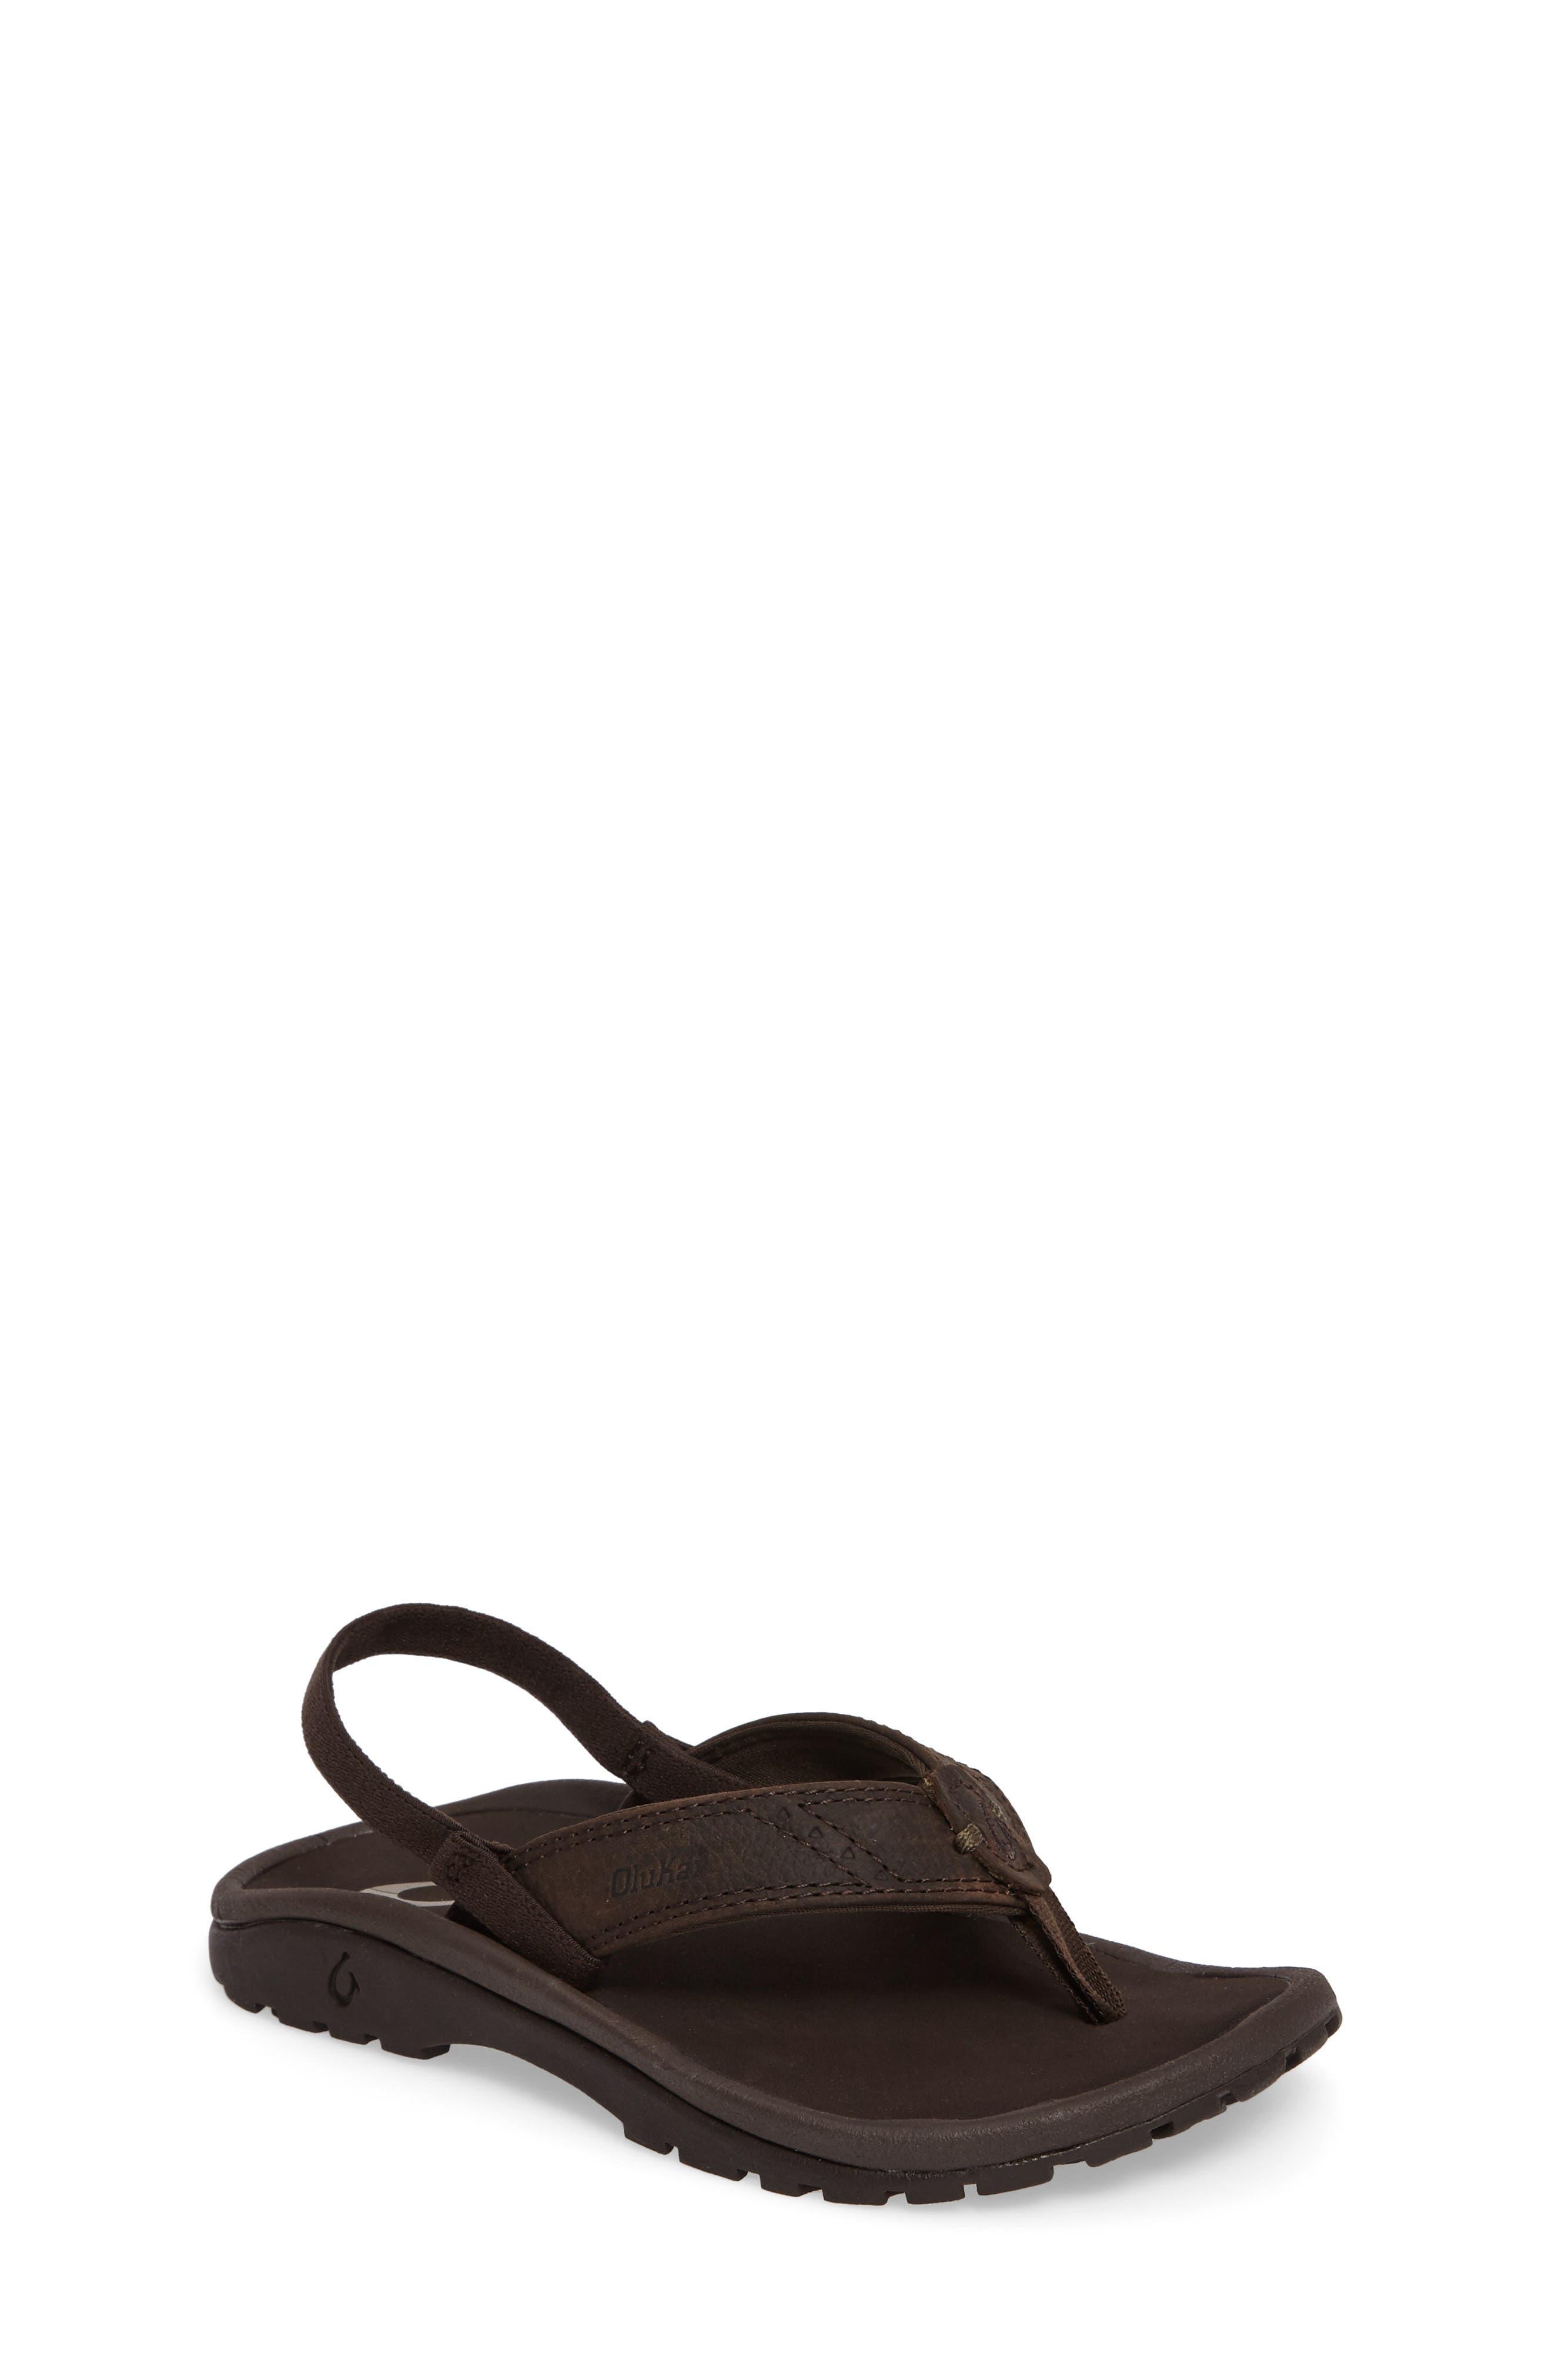 OLUKAI,                             Nui Leather Sandal,                             Main thumbnail 1, color,                             SEAL BROWN/ DARK JAVA